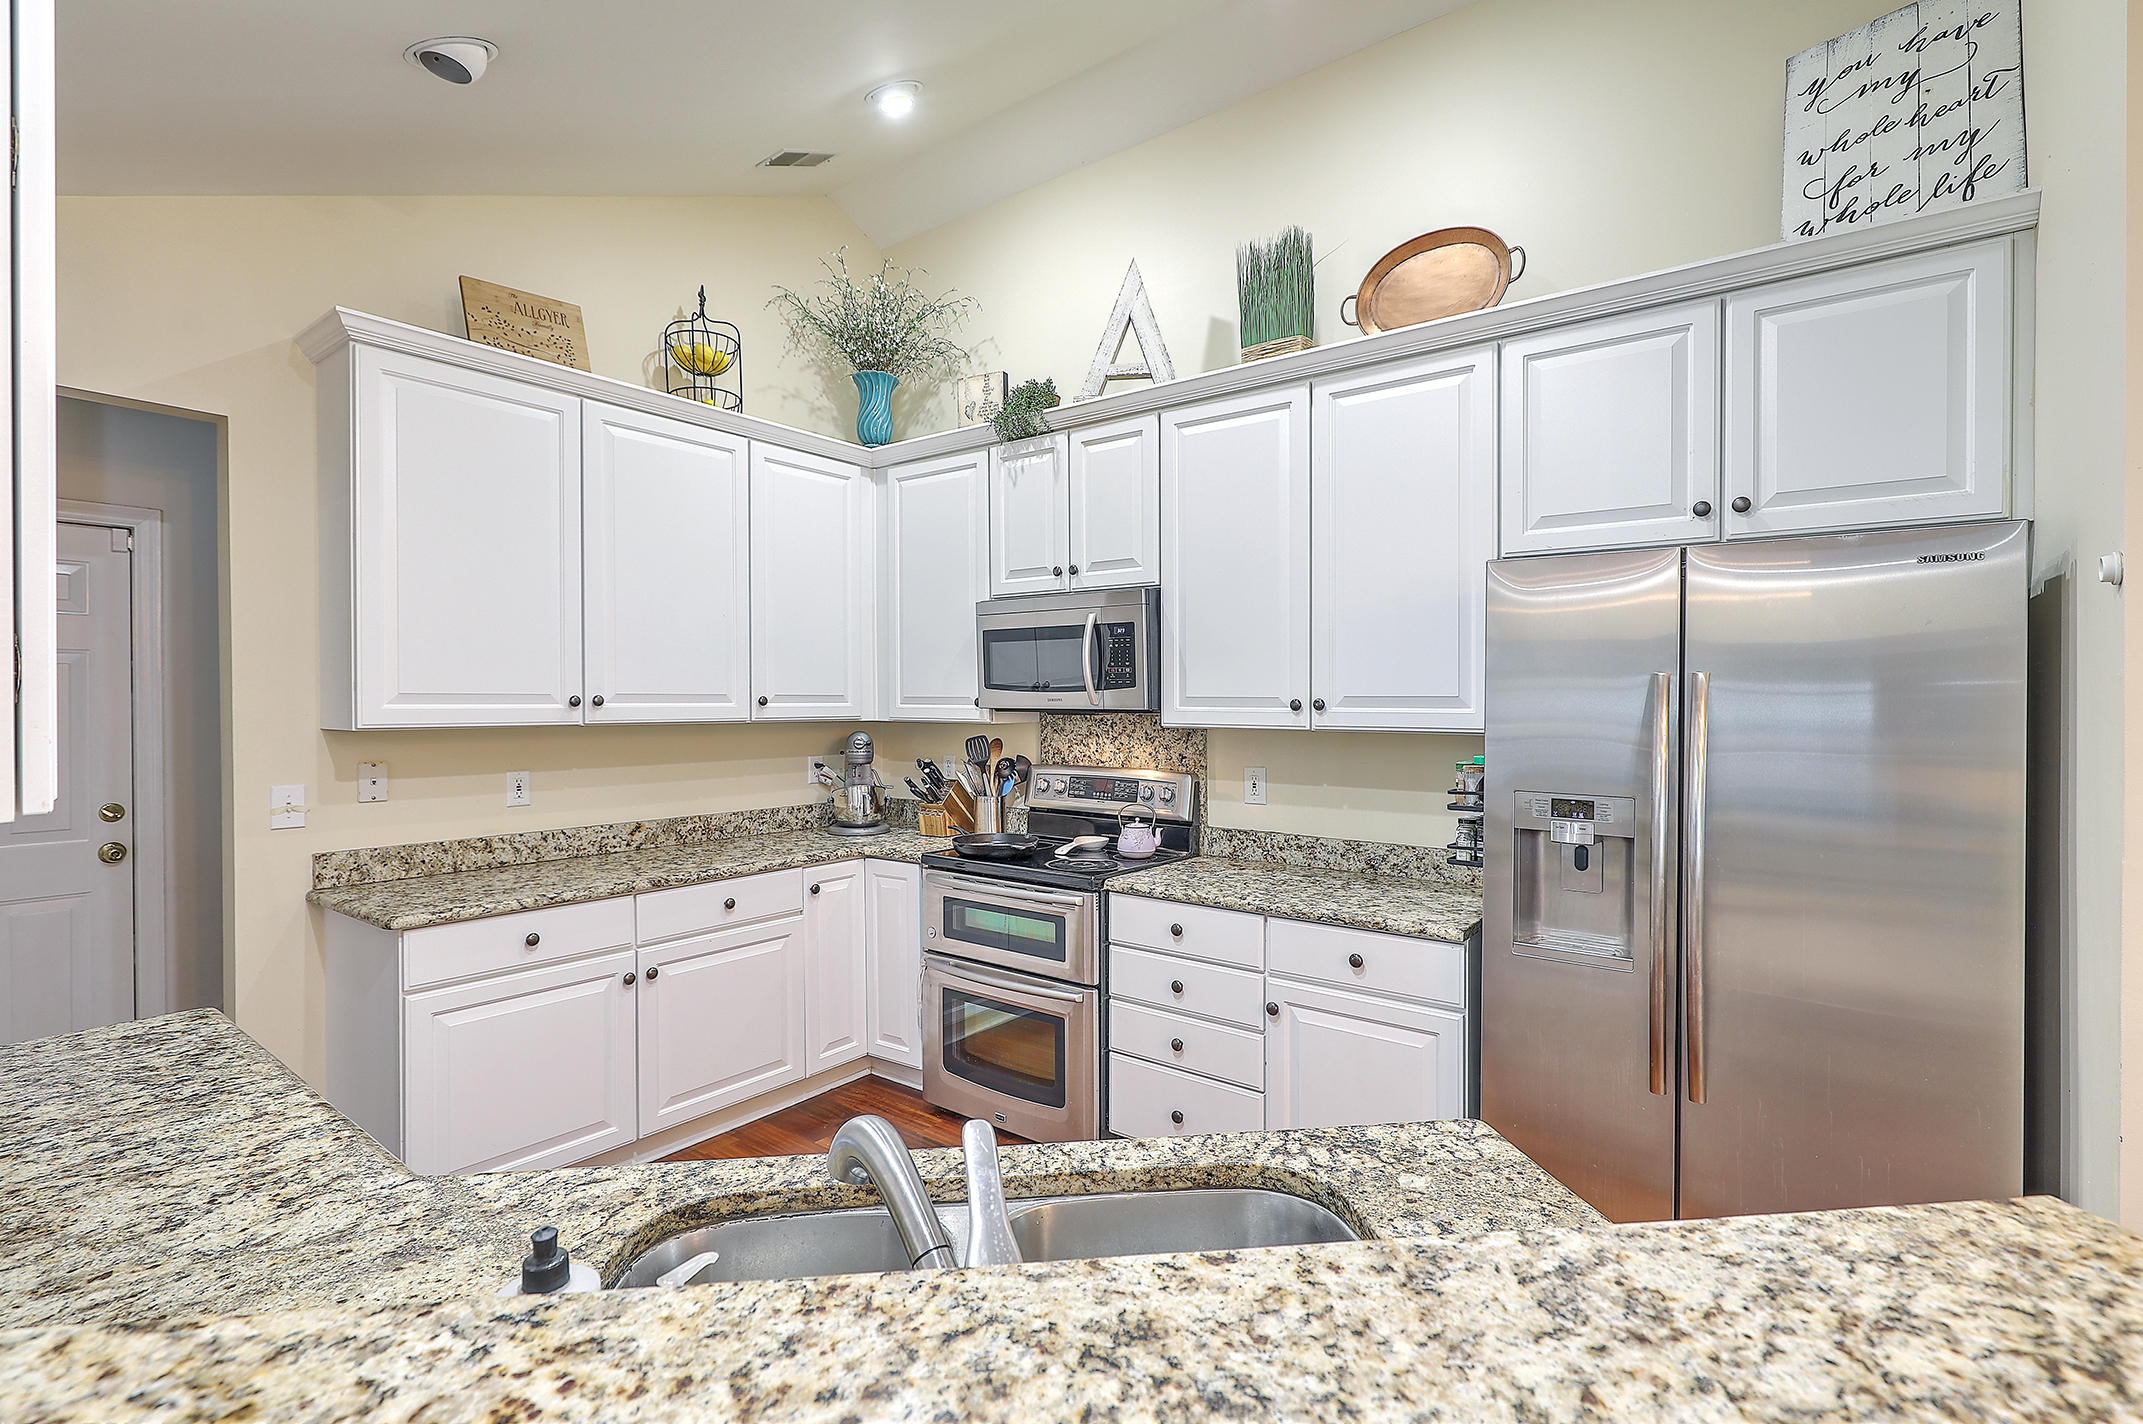 Dunes West Homes For Sale - 1471 Cypress Pointe, Mount Pleasant, SC - 22